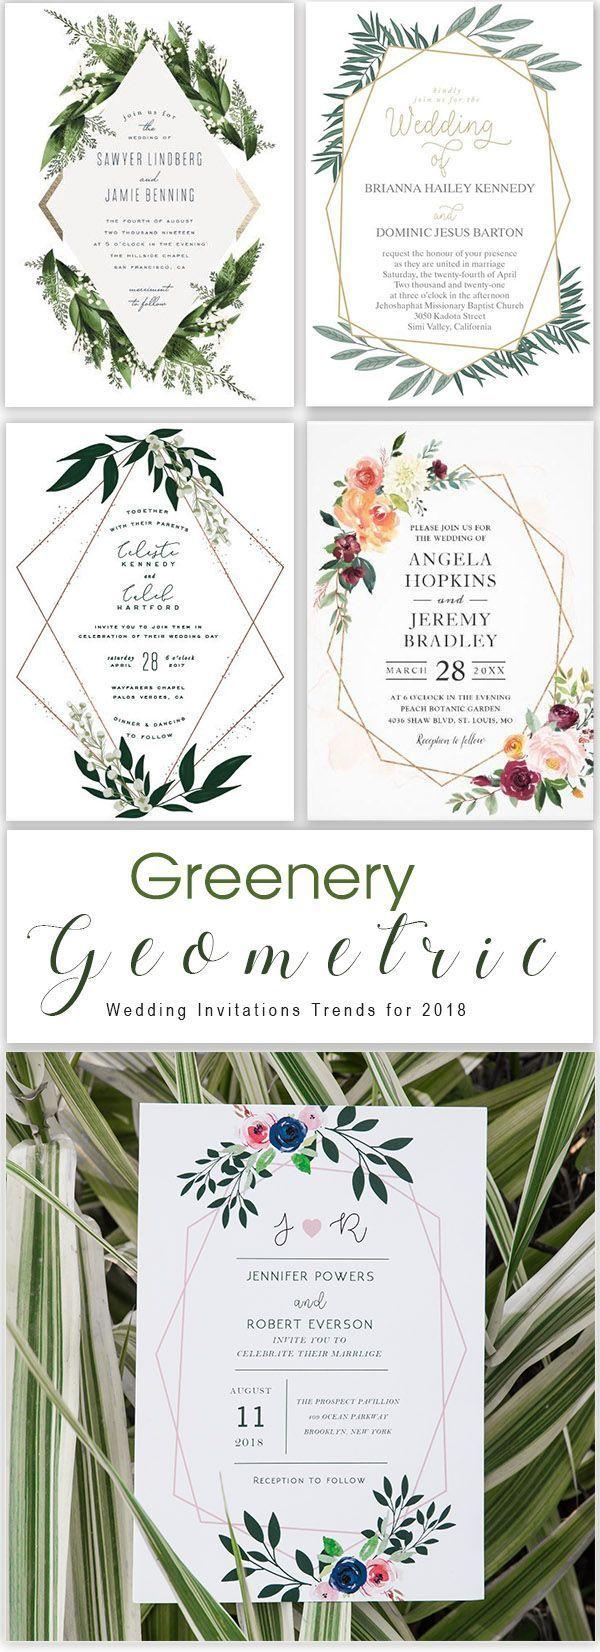 4 Chic Geometric Modern Wedding Invitation Trends for 2019